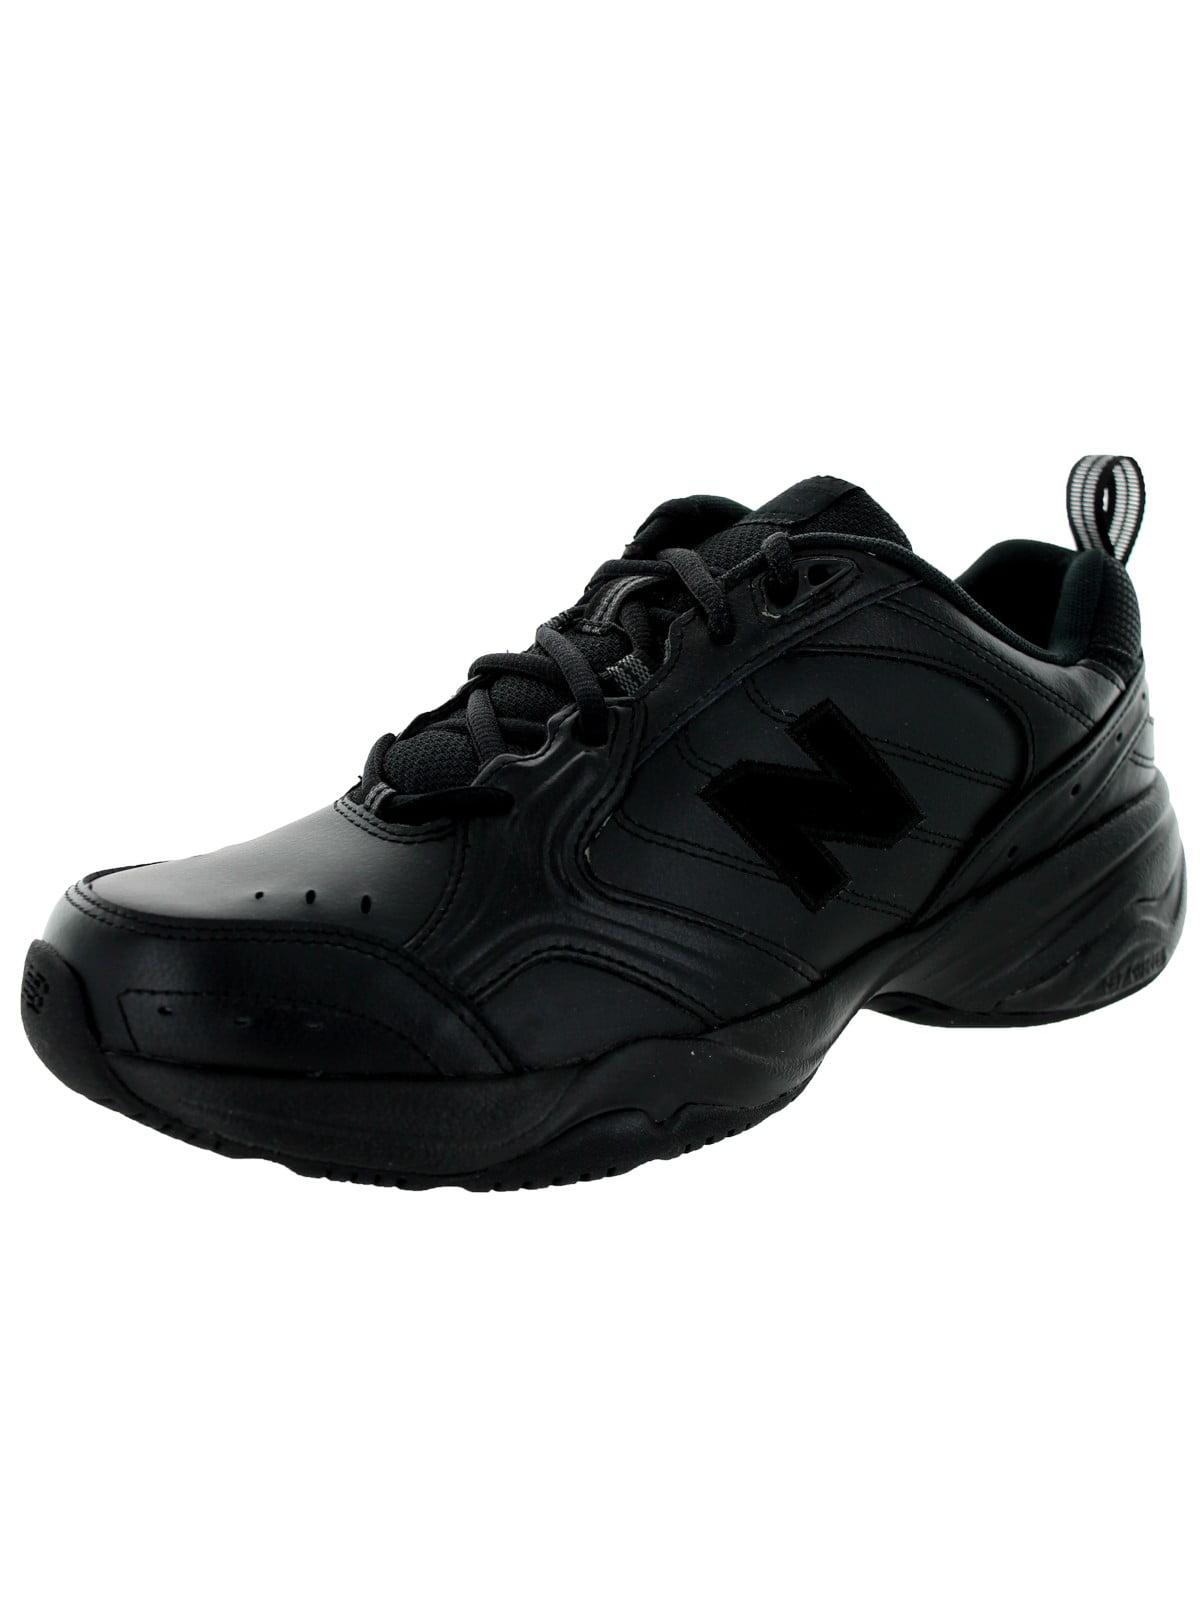 New Balance Men's 624 Training Shoe by New Balance